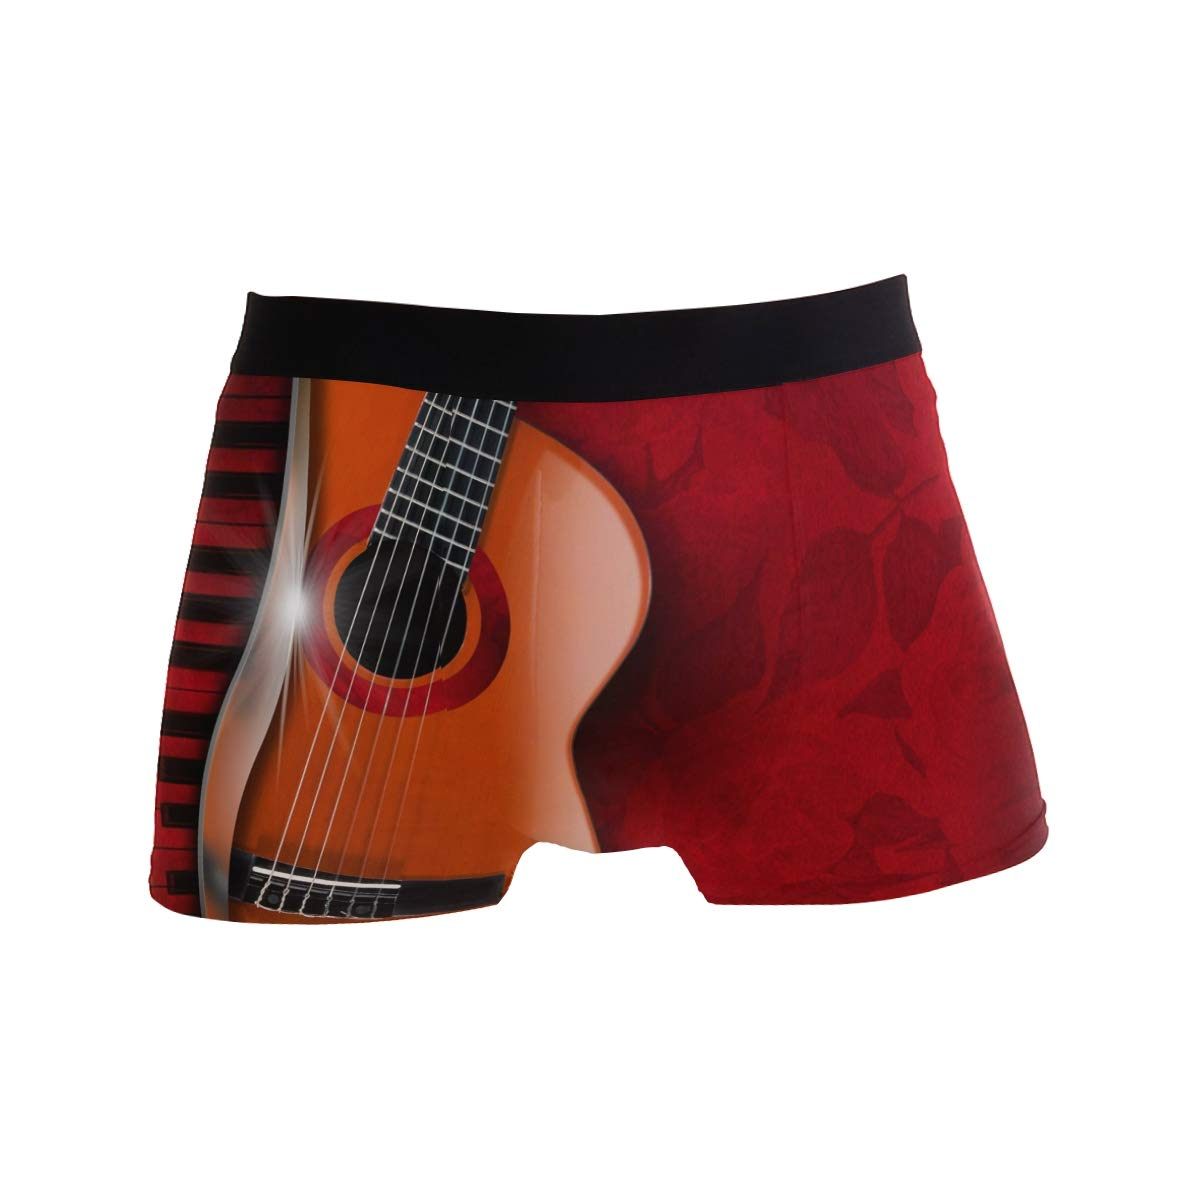 Music Guitar Piano Flower Short Underwear Soft Stretch Underpants for Men Boys S-XL BETTKEN Mens Boxer Briefs